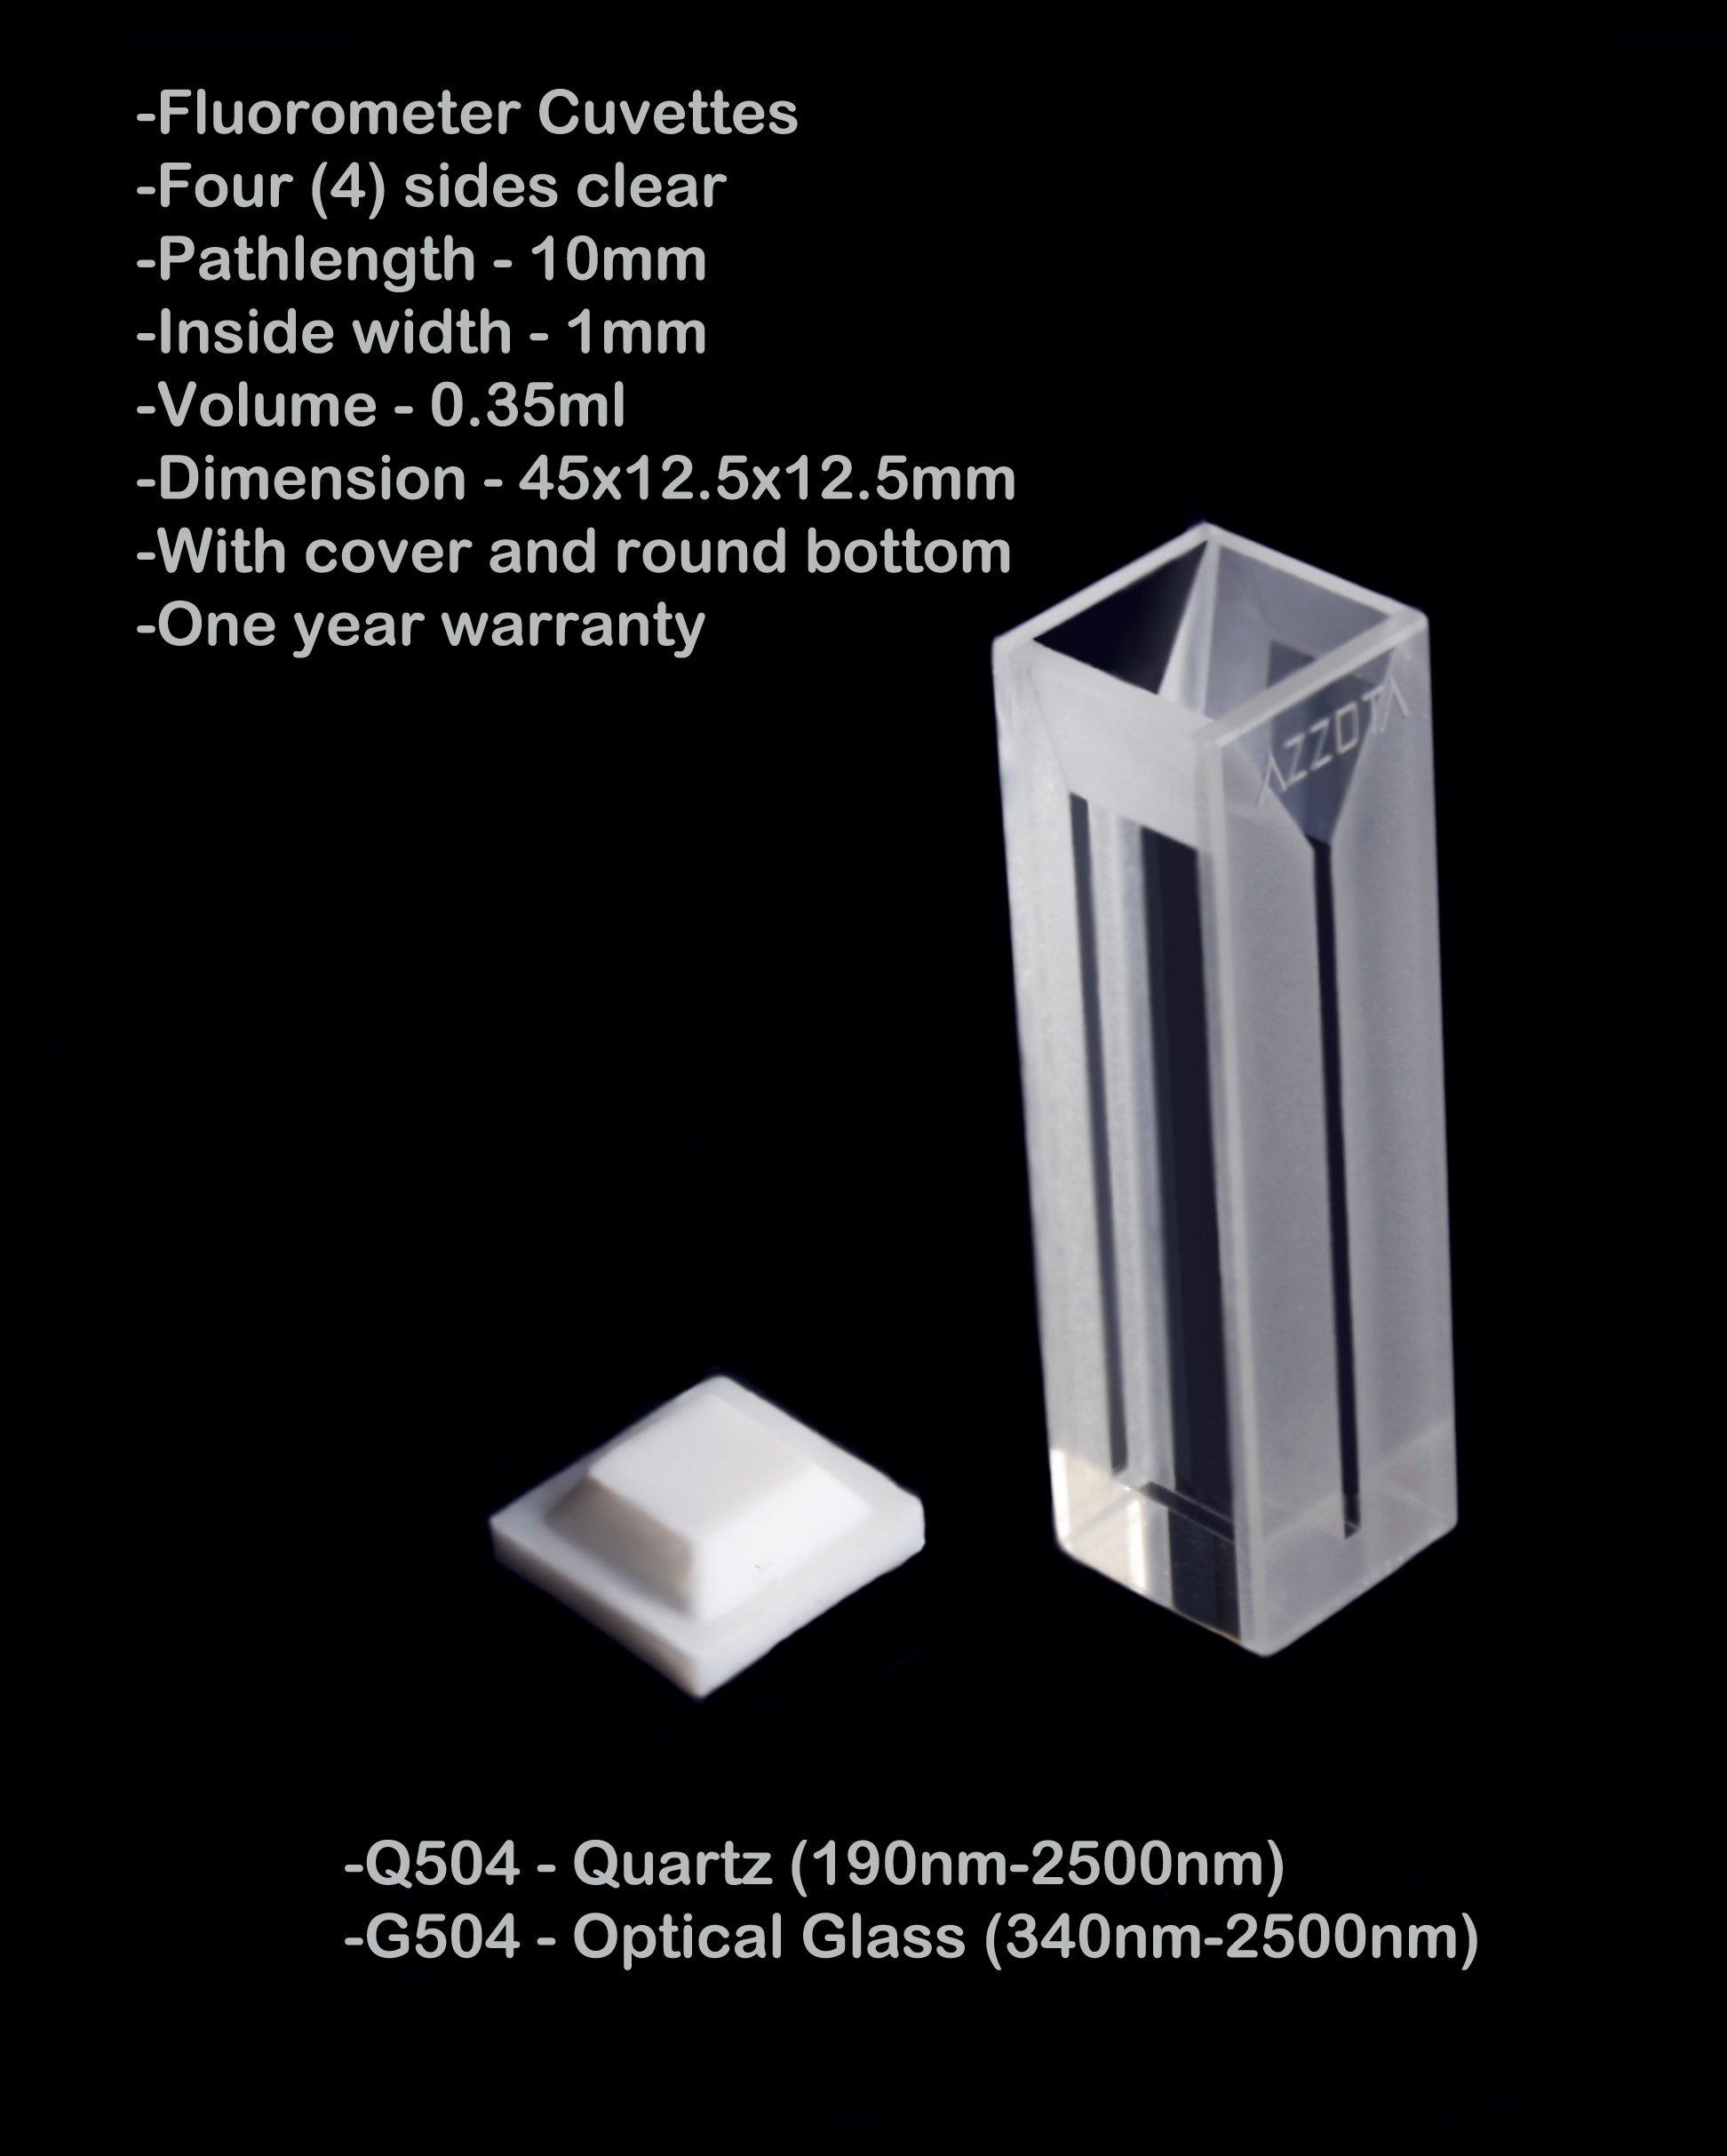 10mm Pathlength Fluorometer Cuvettes - 0.35ml Quartz